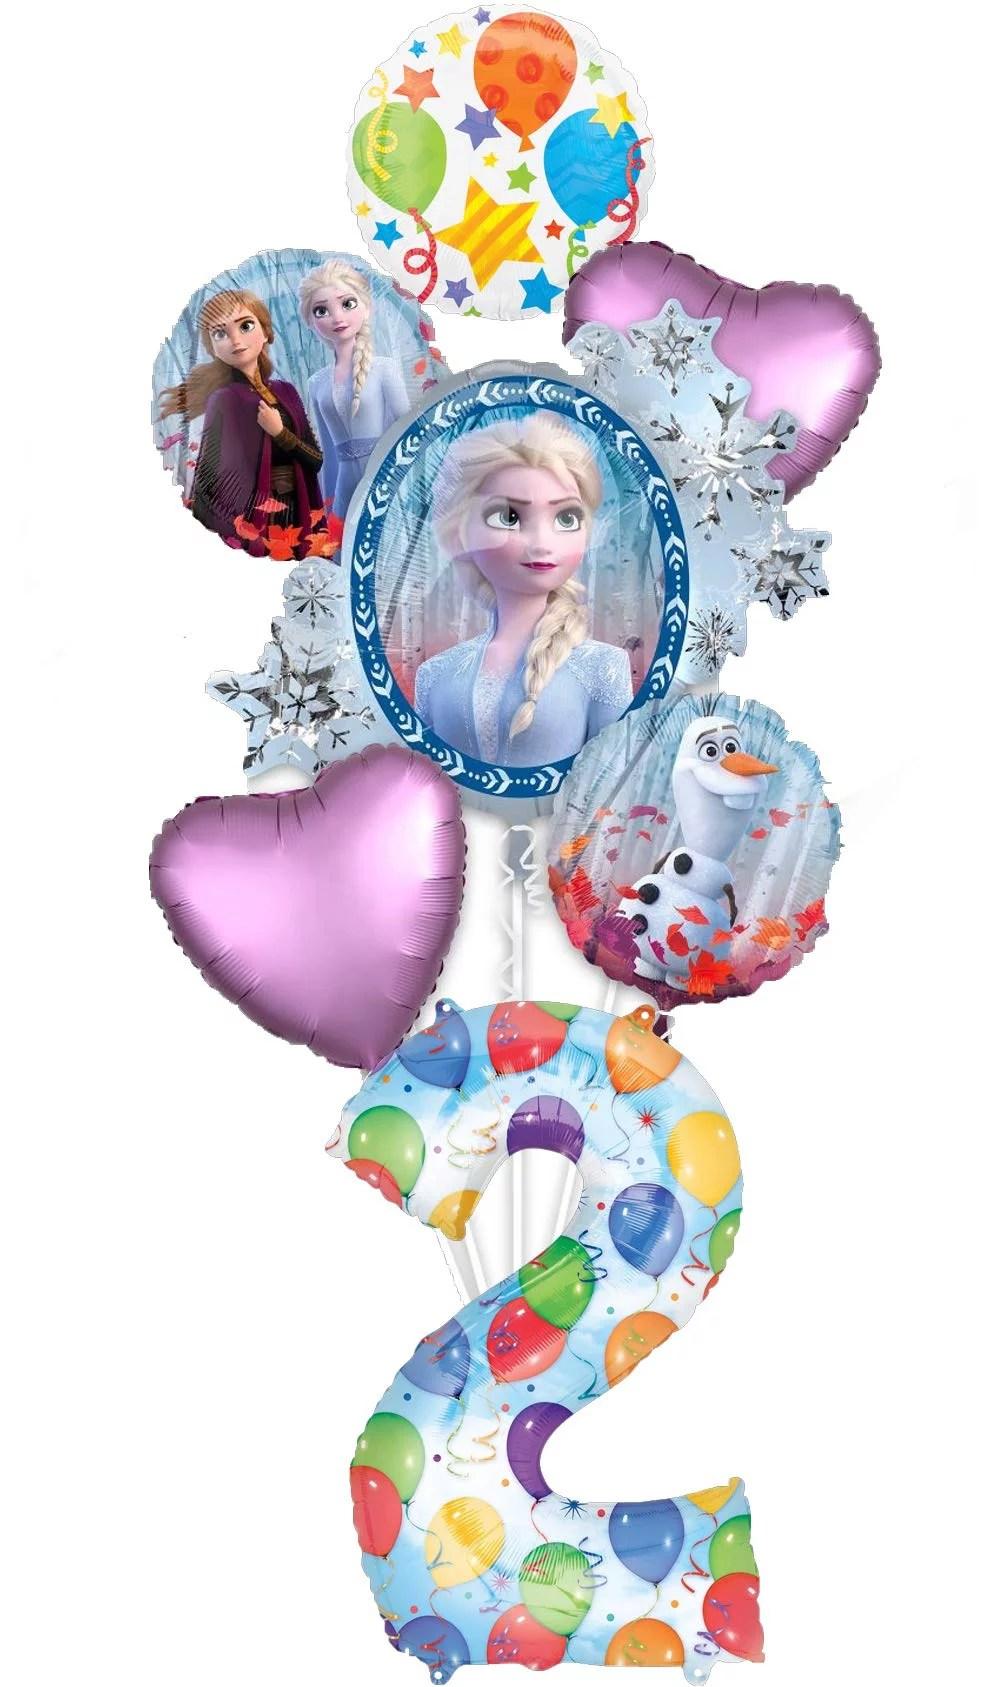 Frozen 2 Party Supplies 2nd Birthday Elsa Anna And Olaf Balloon Bouquet Decorations Walmart Com Walmart Com